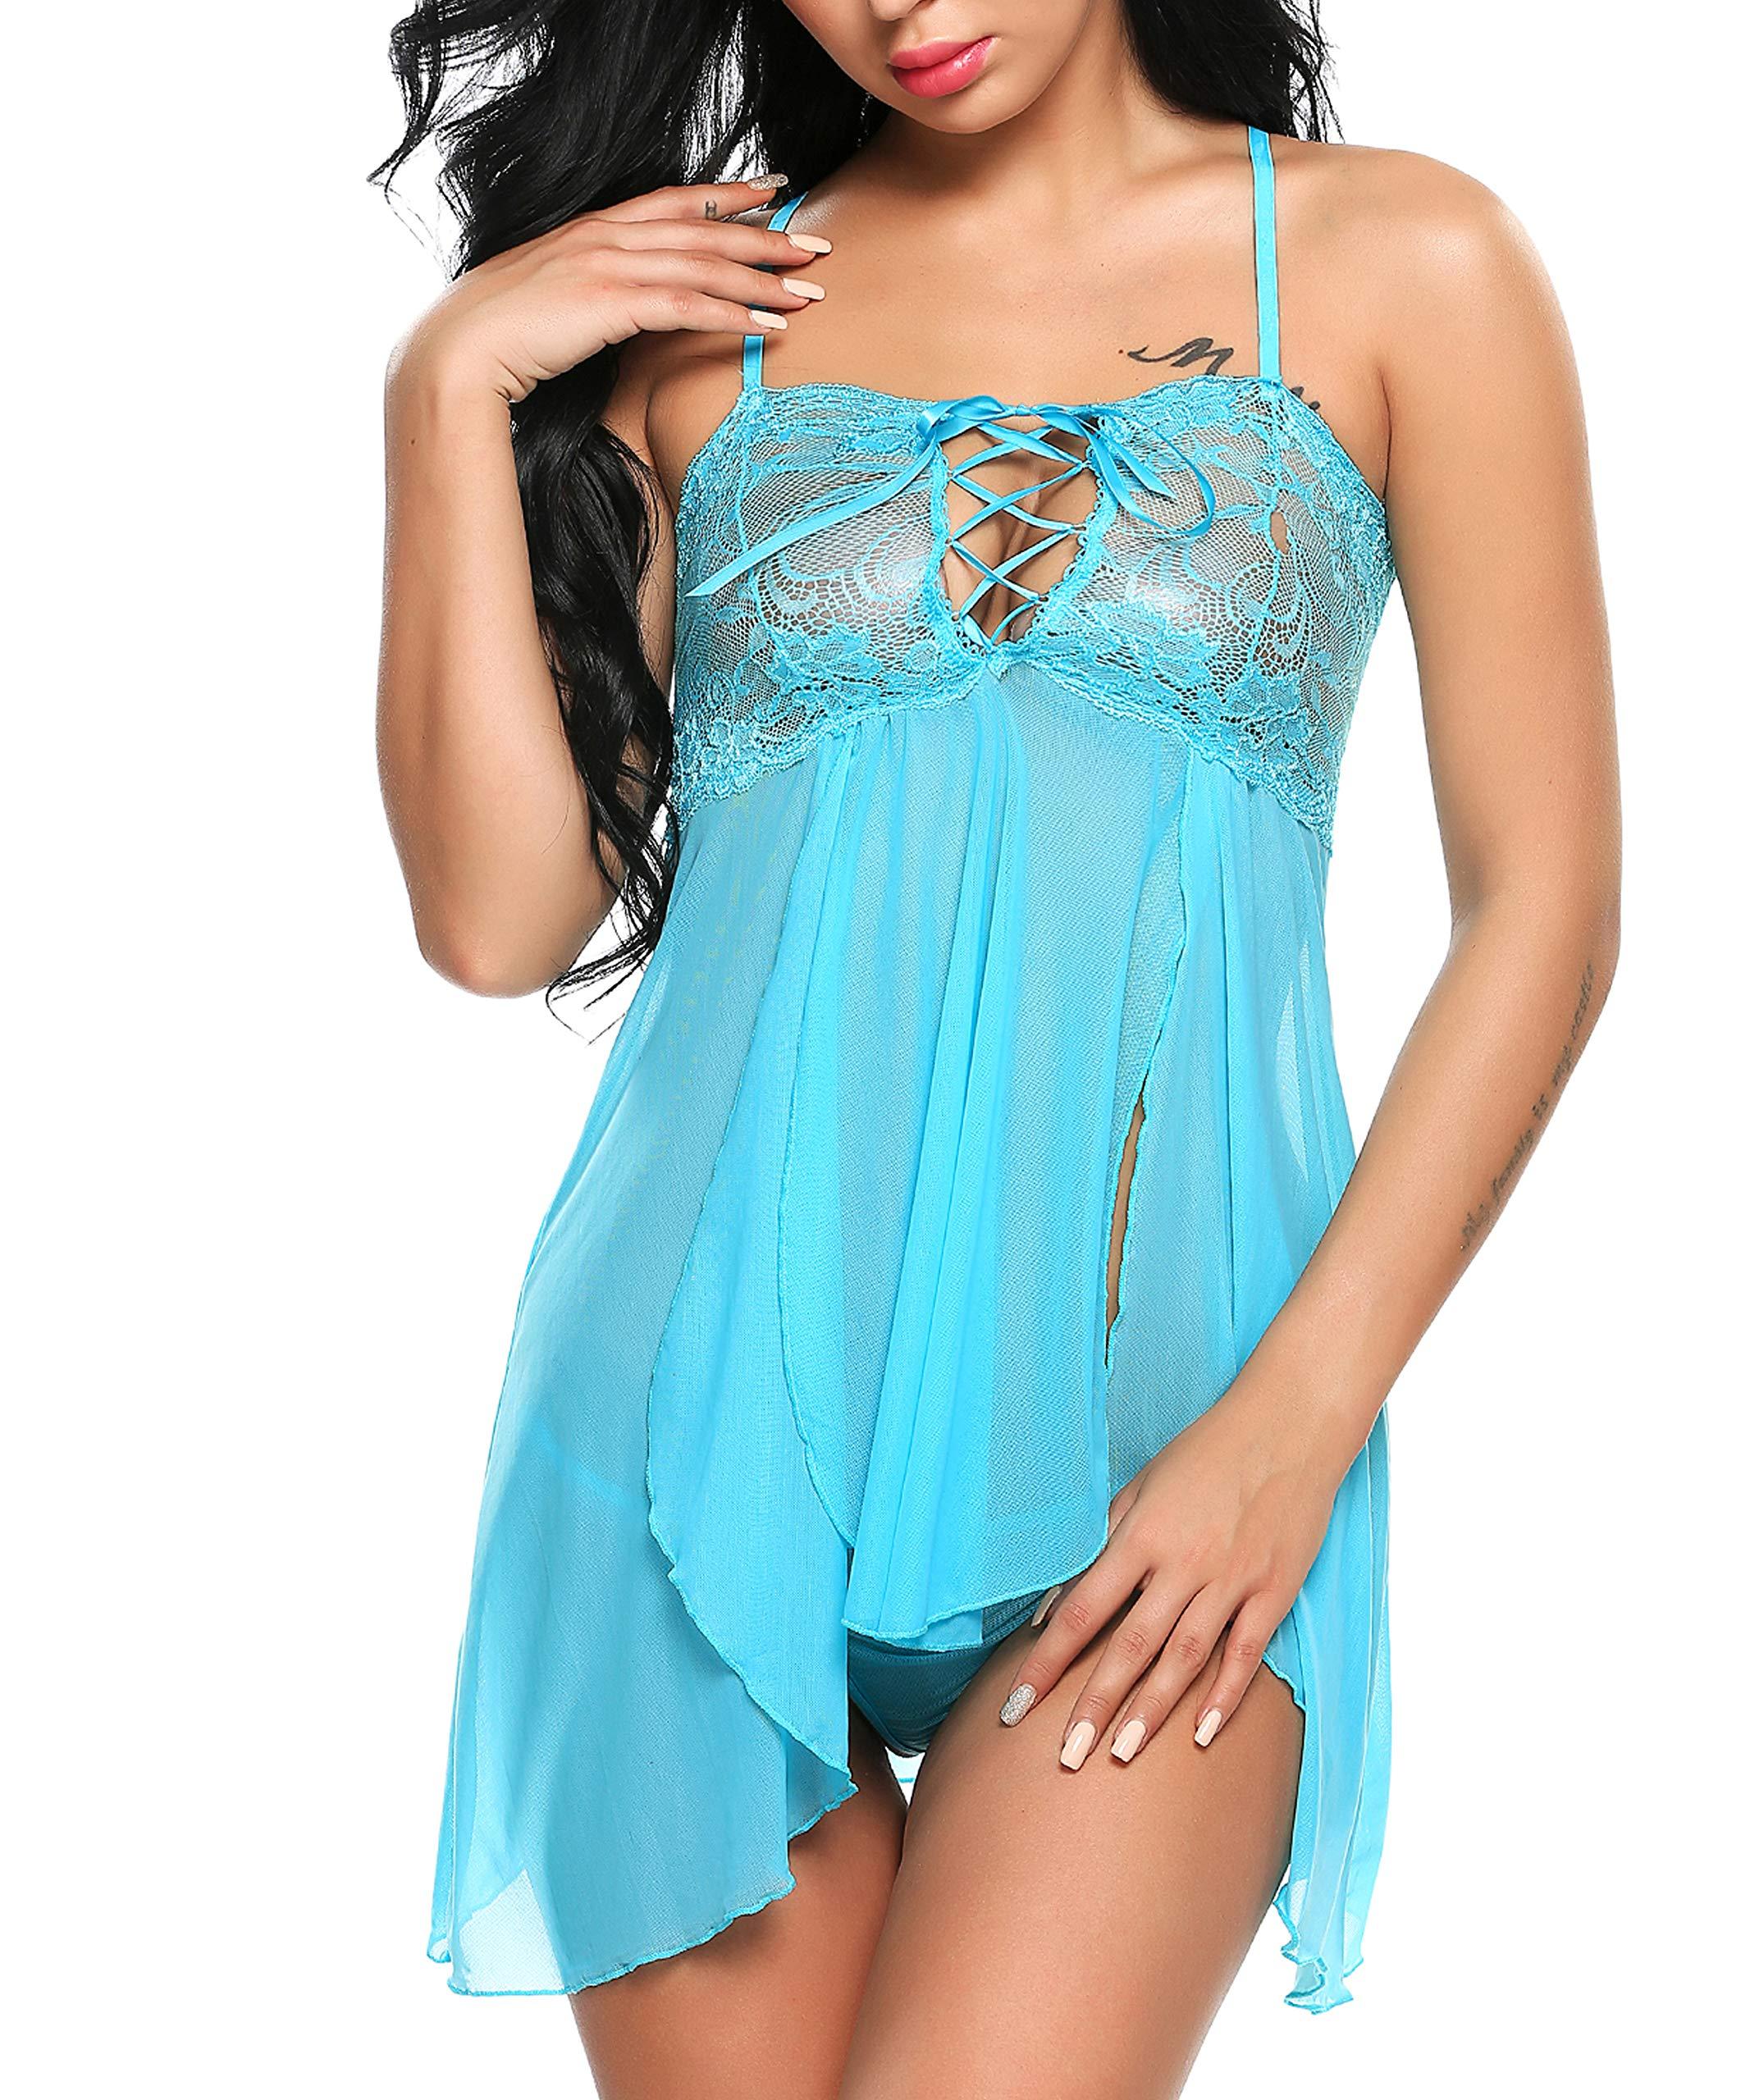 Avidlove Women Strappy Sexy Lingerie Set Babydoll Lace Bra Chemises Set